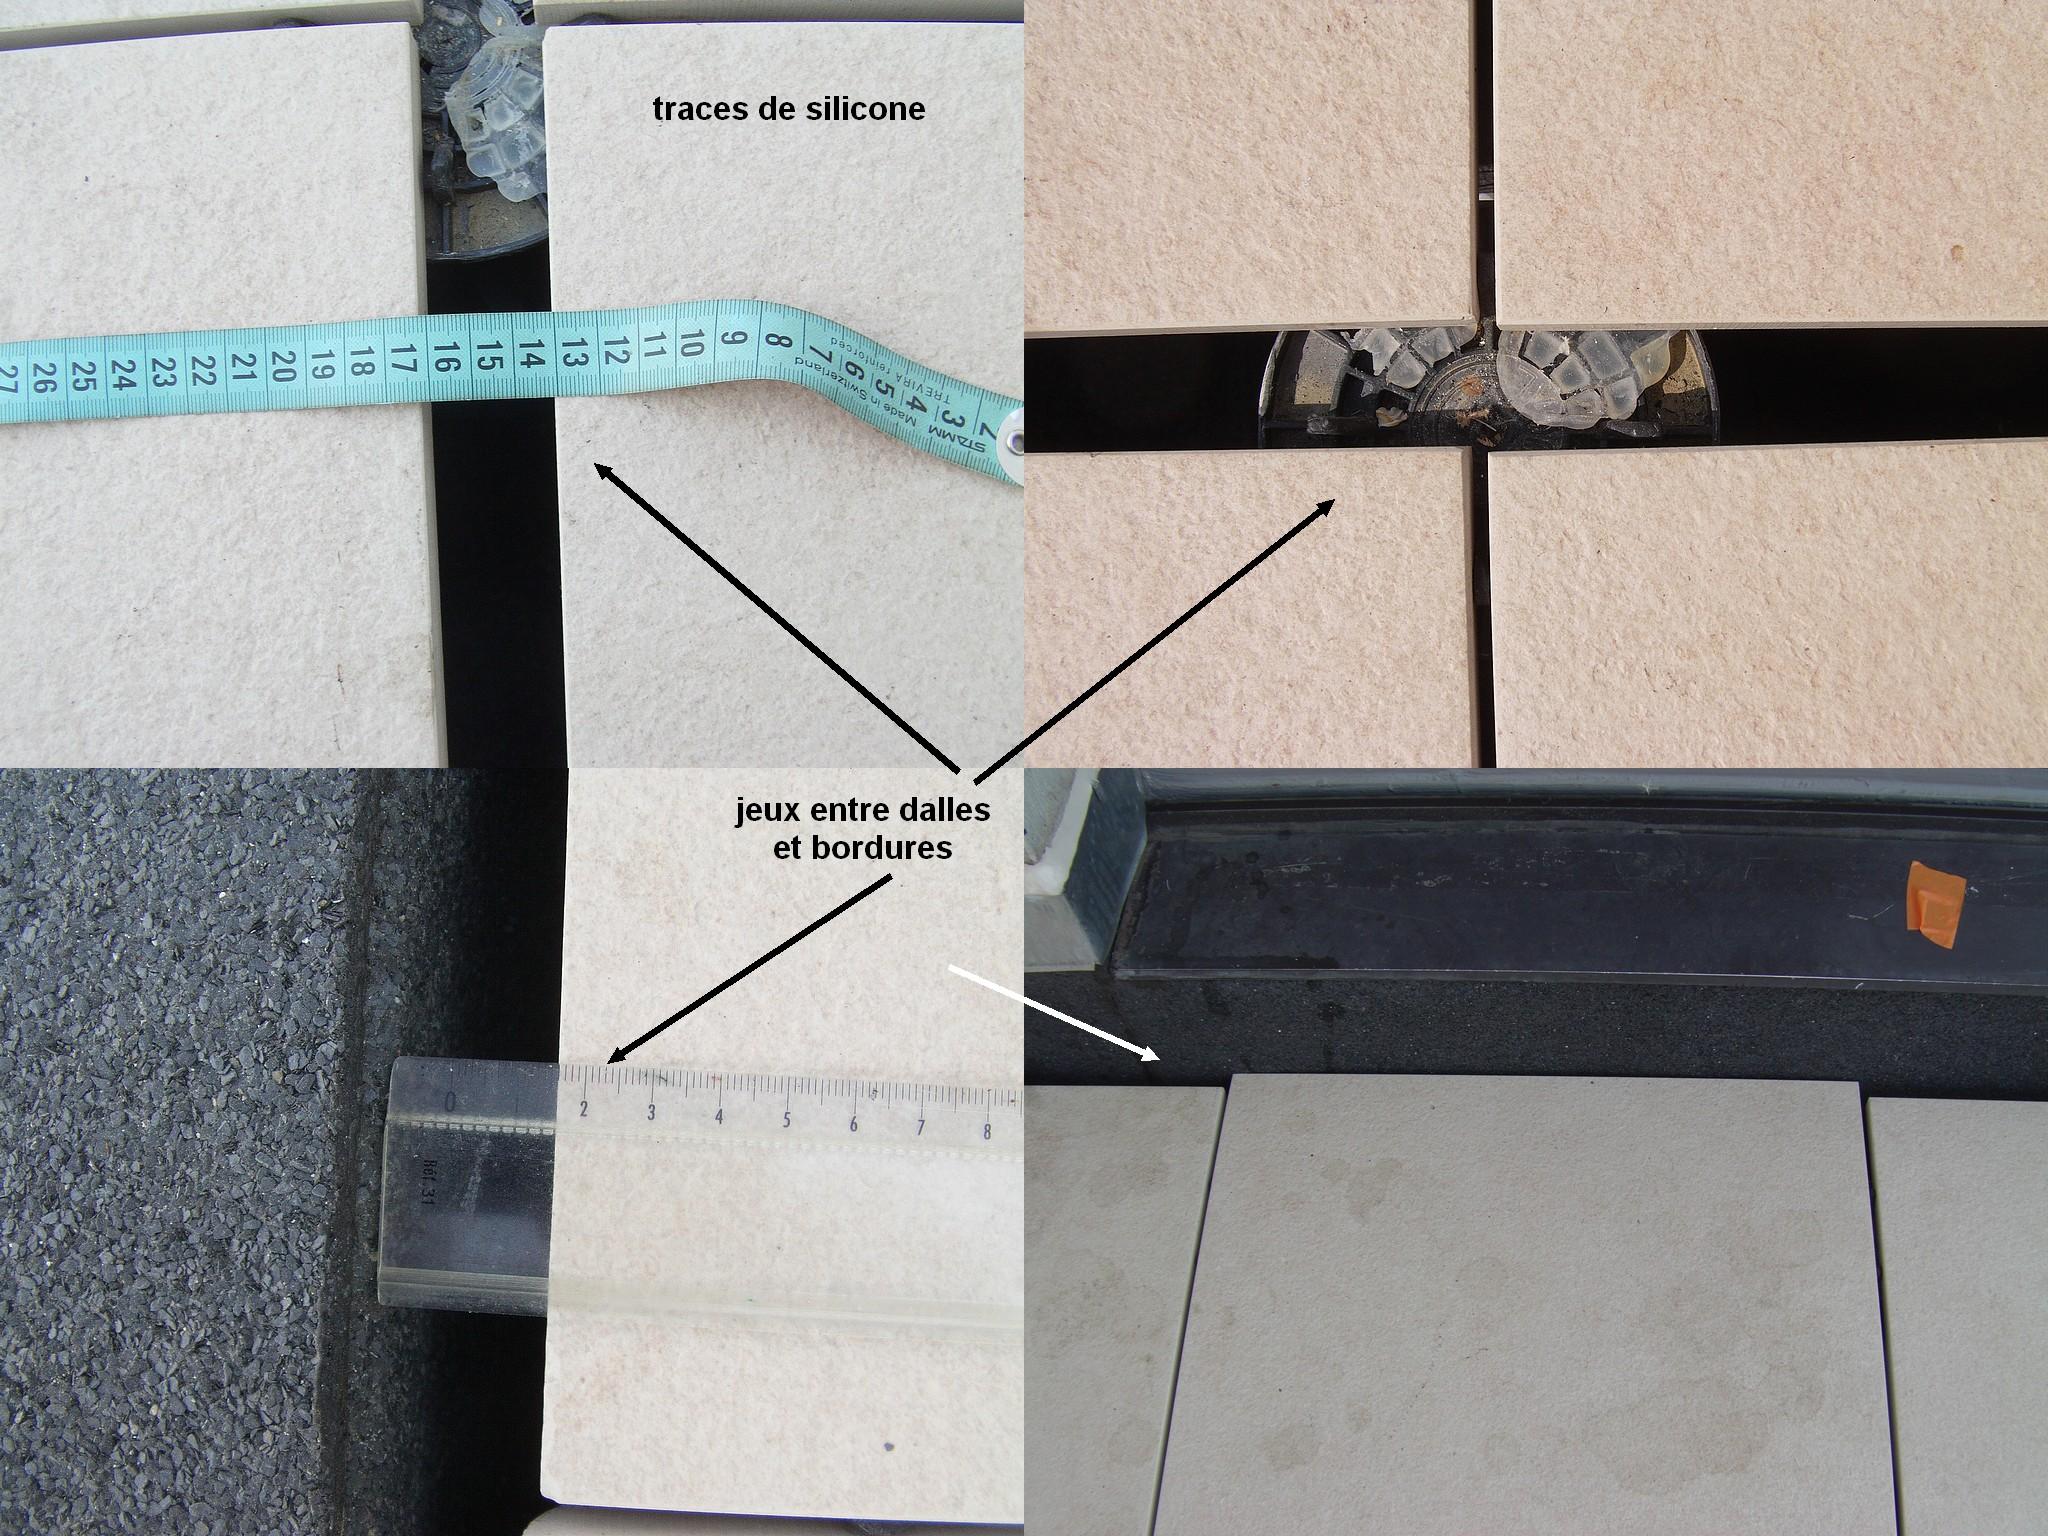 etat-bordures-ecarts-finition-dalles-210418_(19).jpg